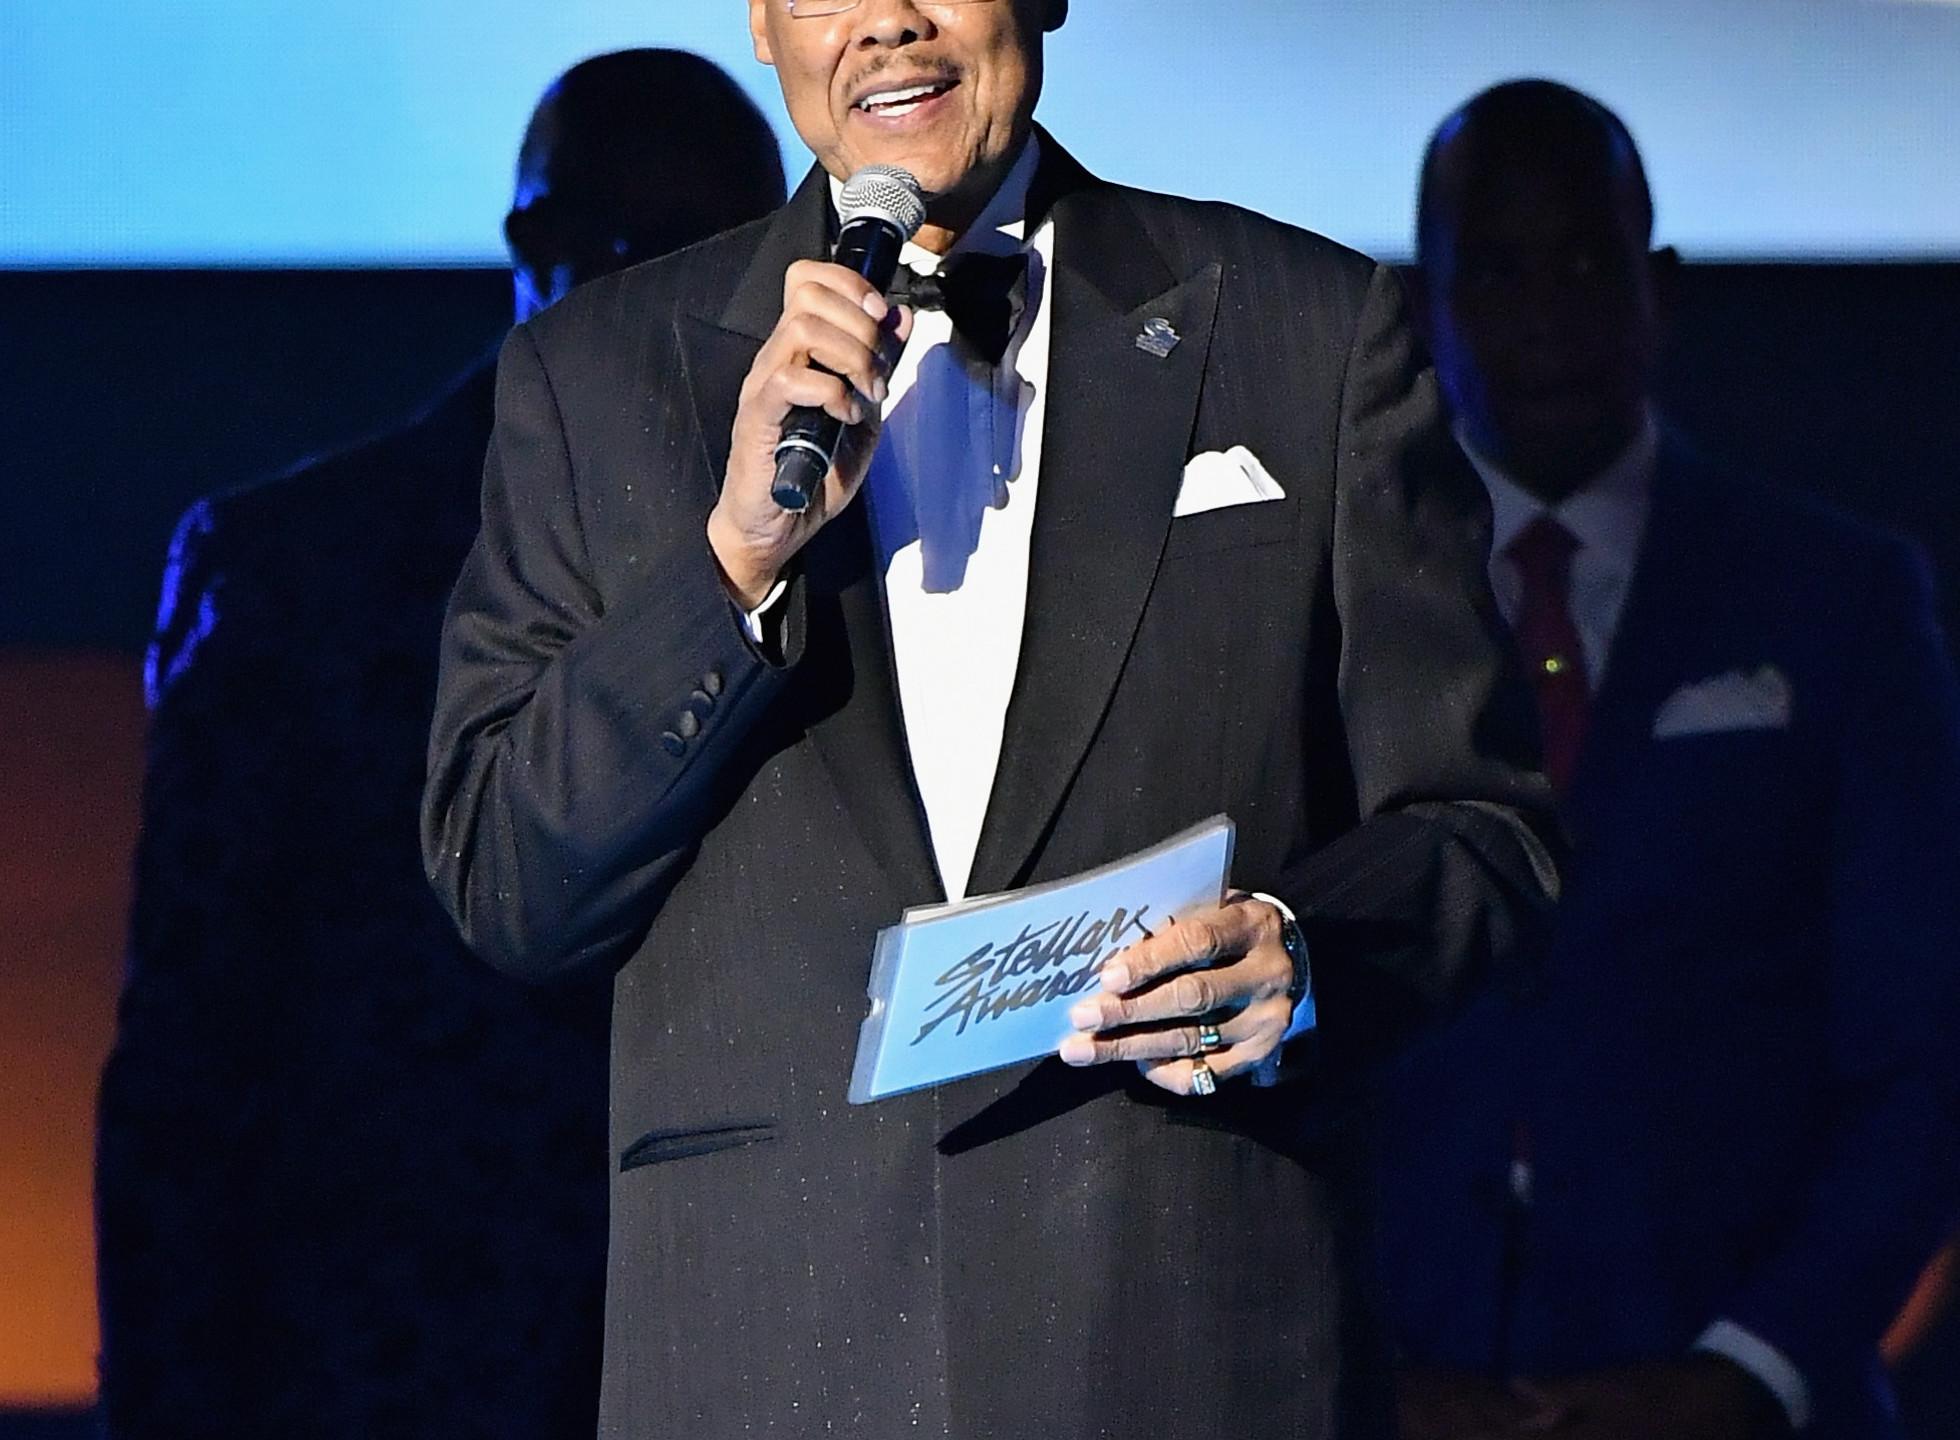 Don Jackson opening remarks